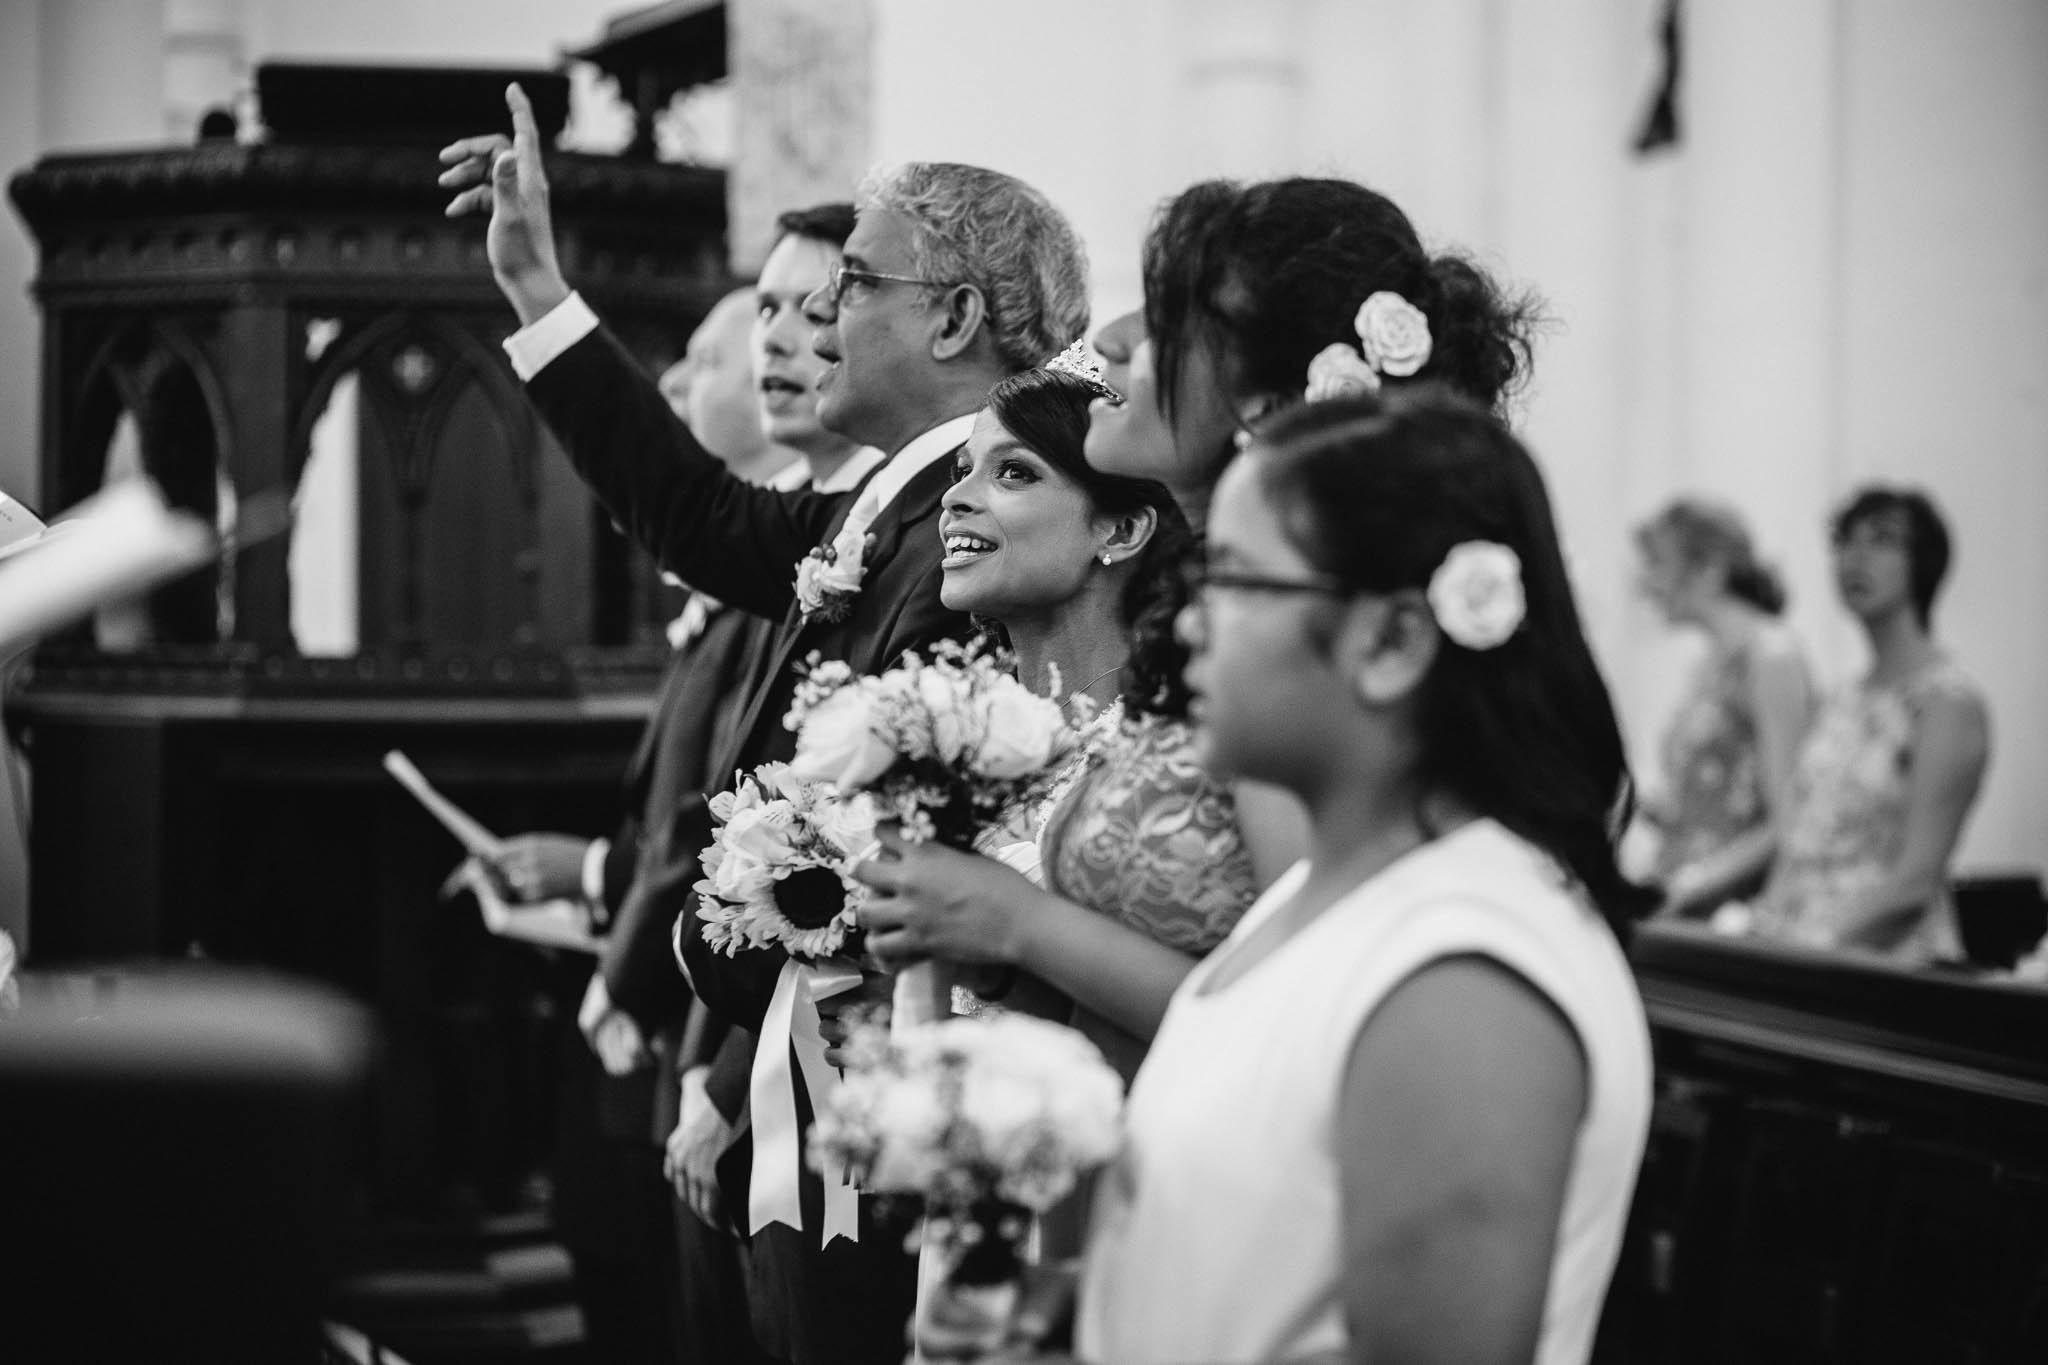 singapore-wedding-photographer-st-andrews-cathedral-renita-david-13.jpg